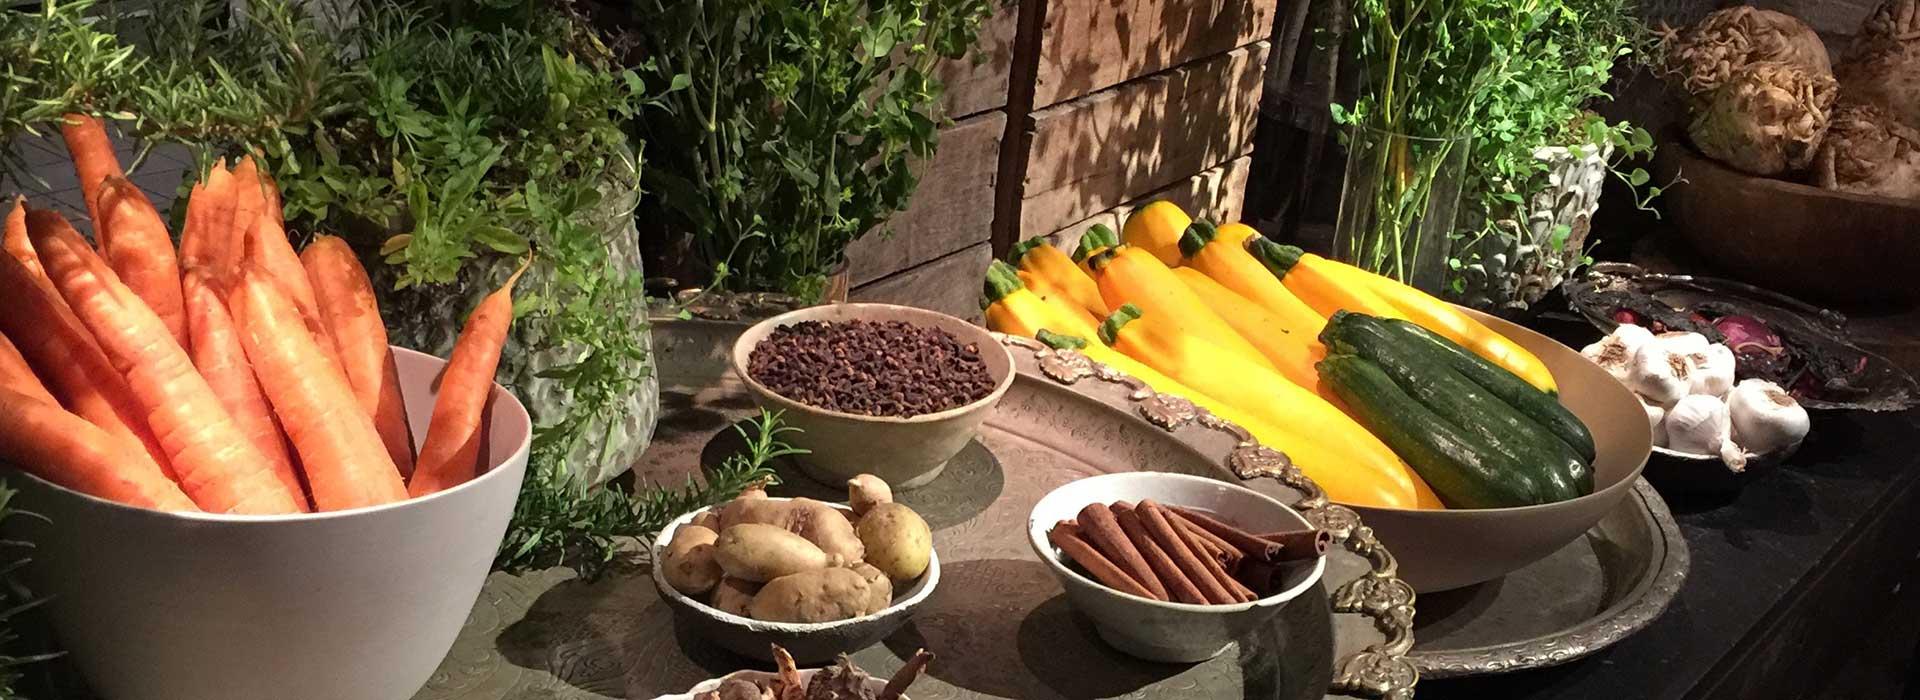 david-london-food-resources